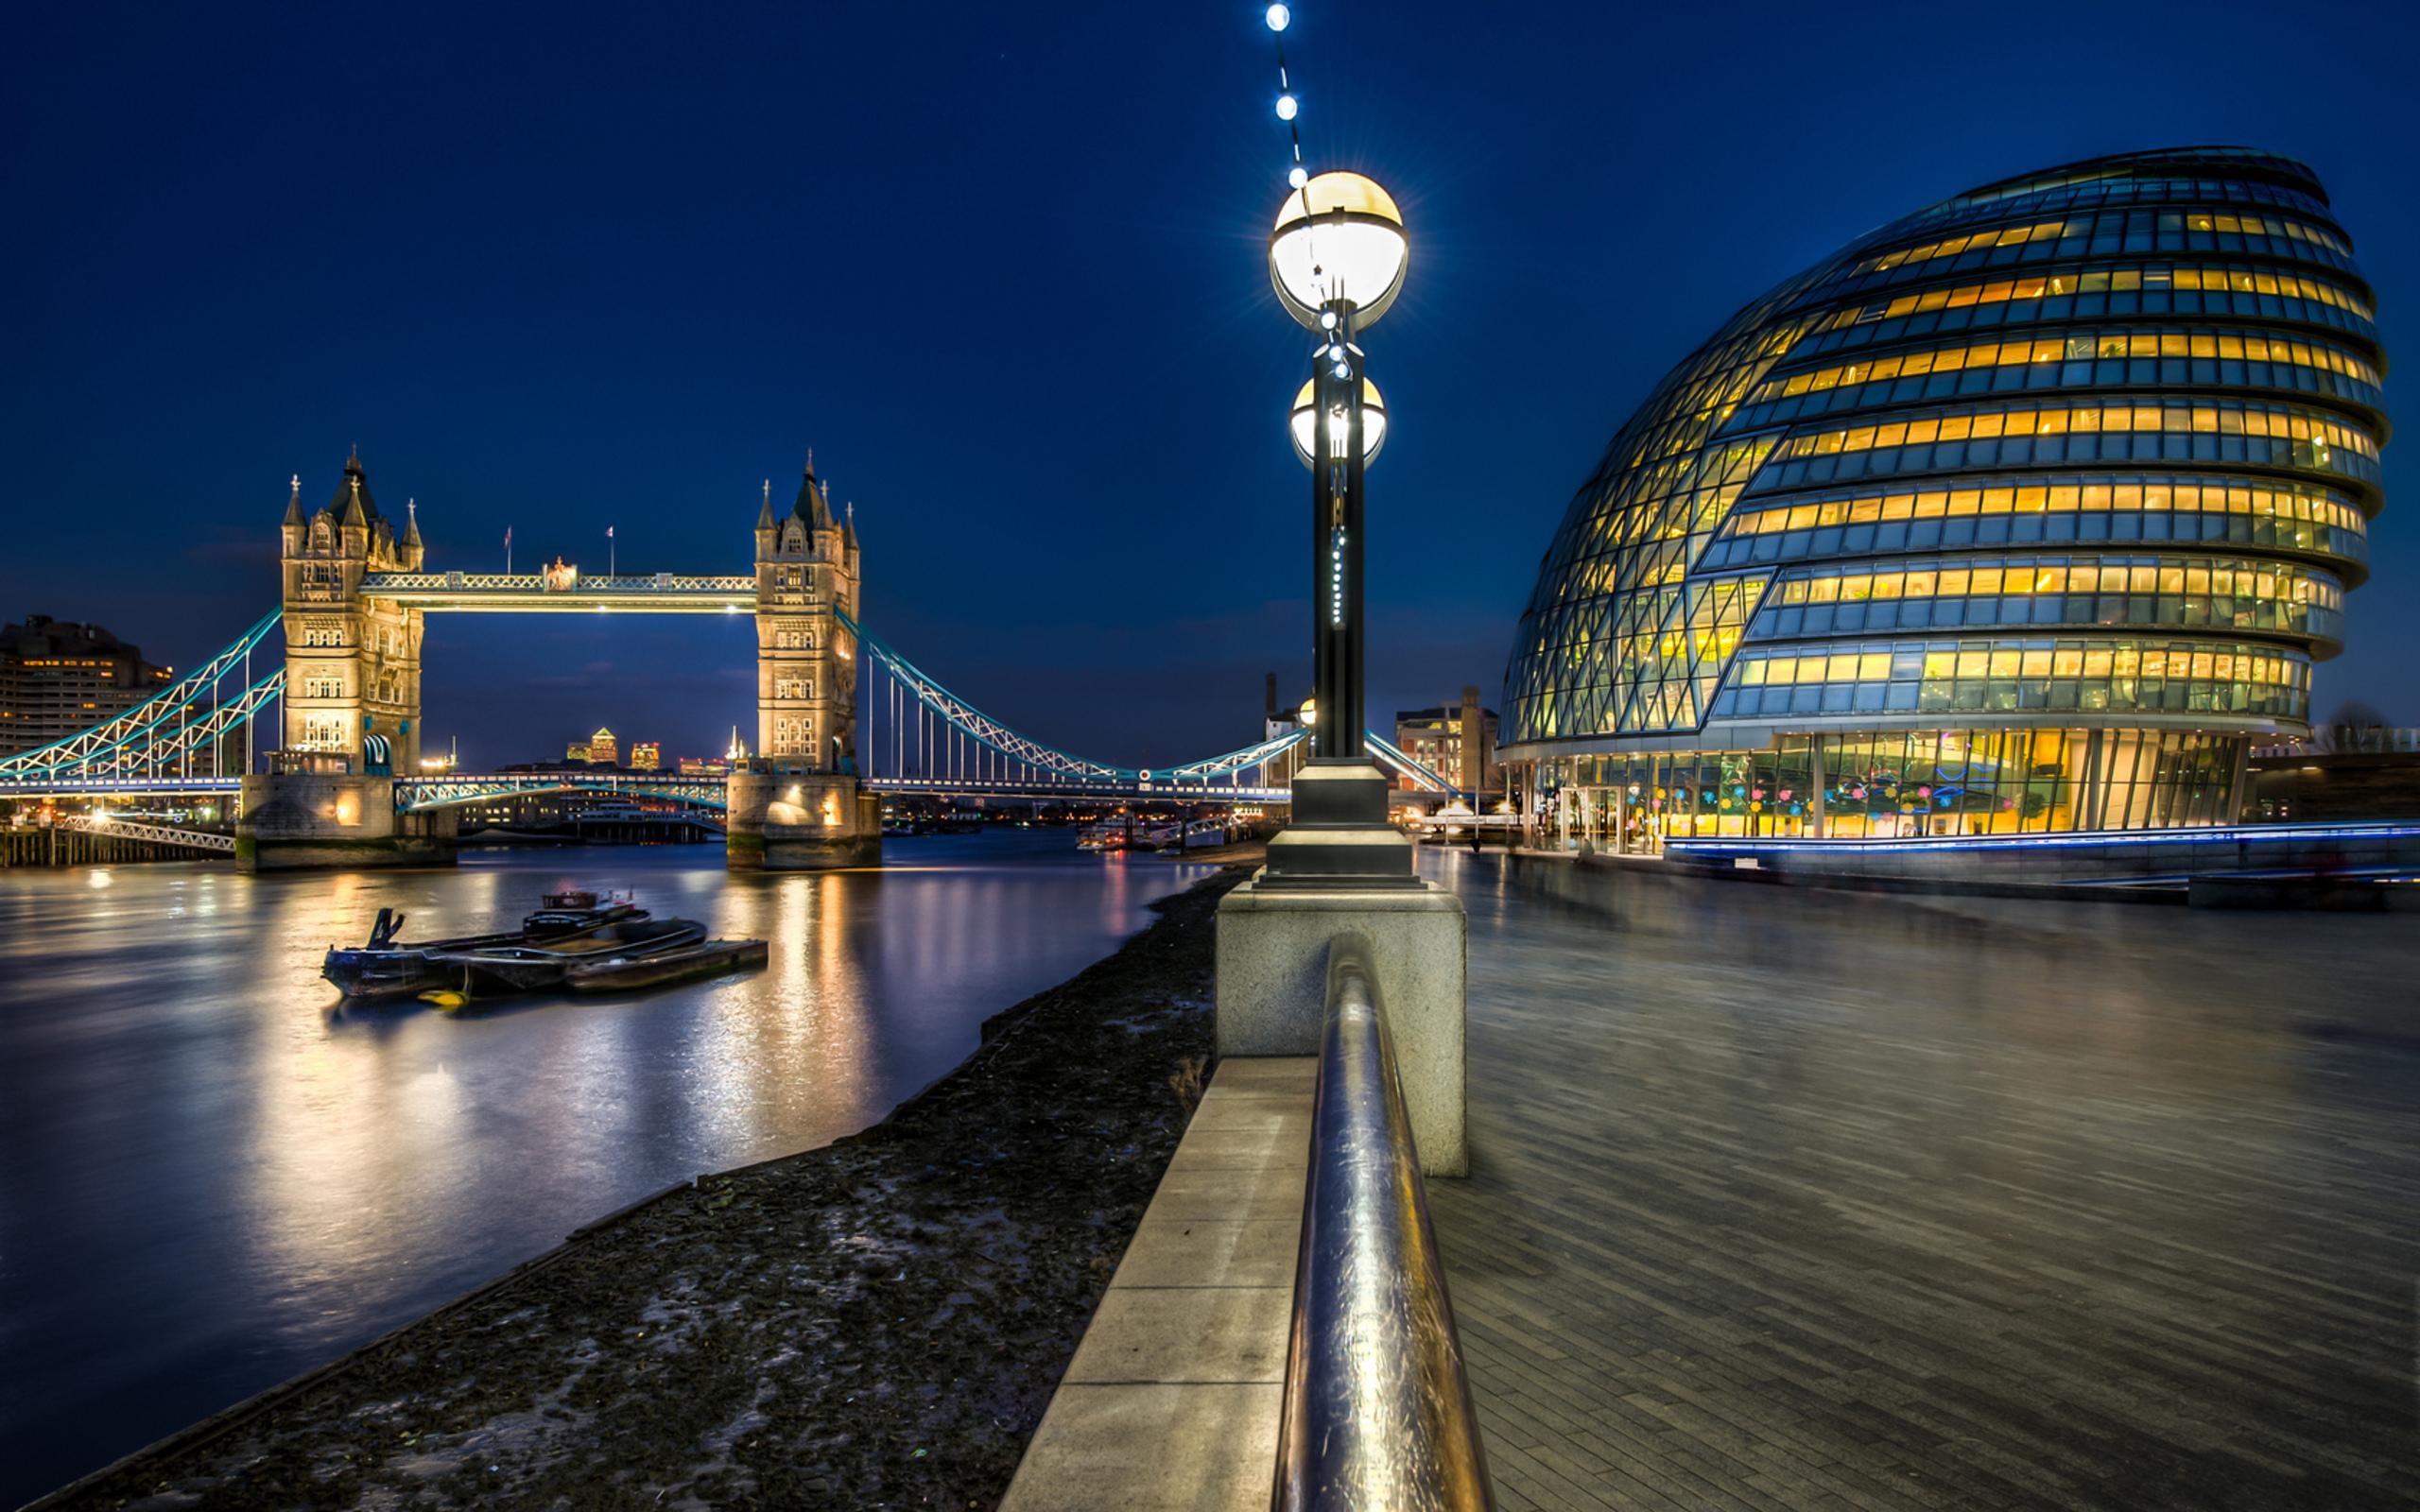 Tower Bridge Wallpaper